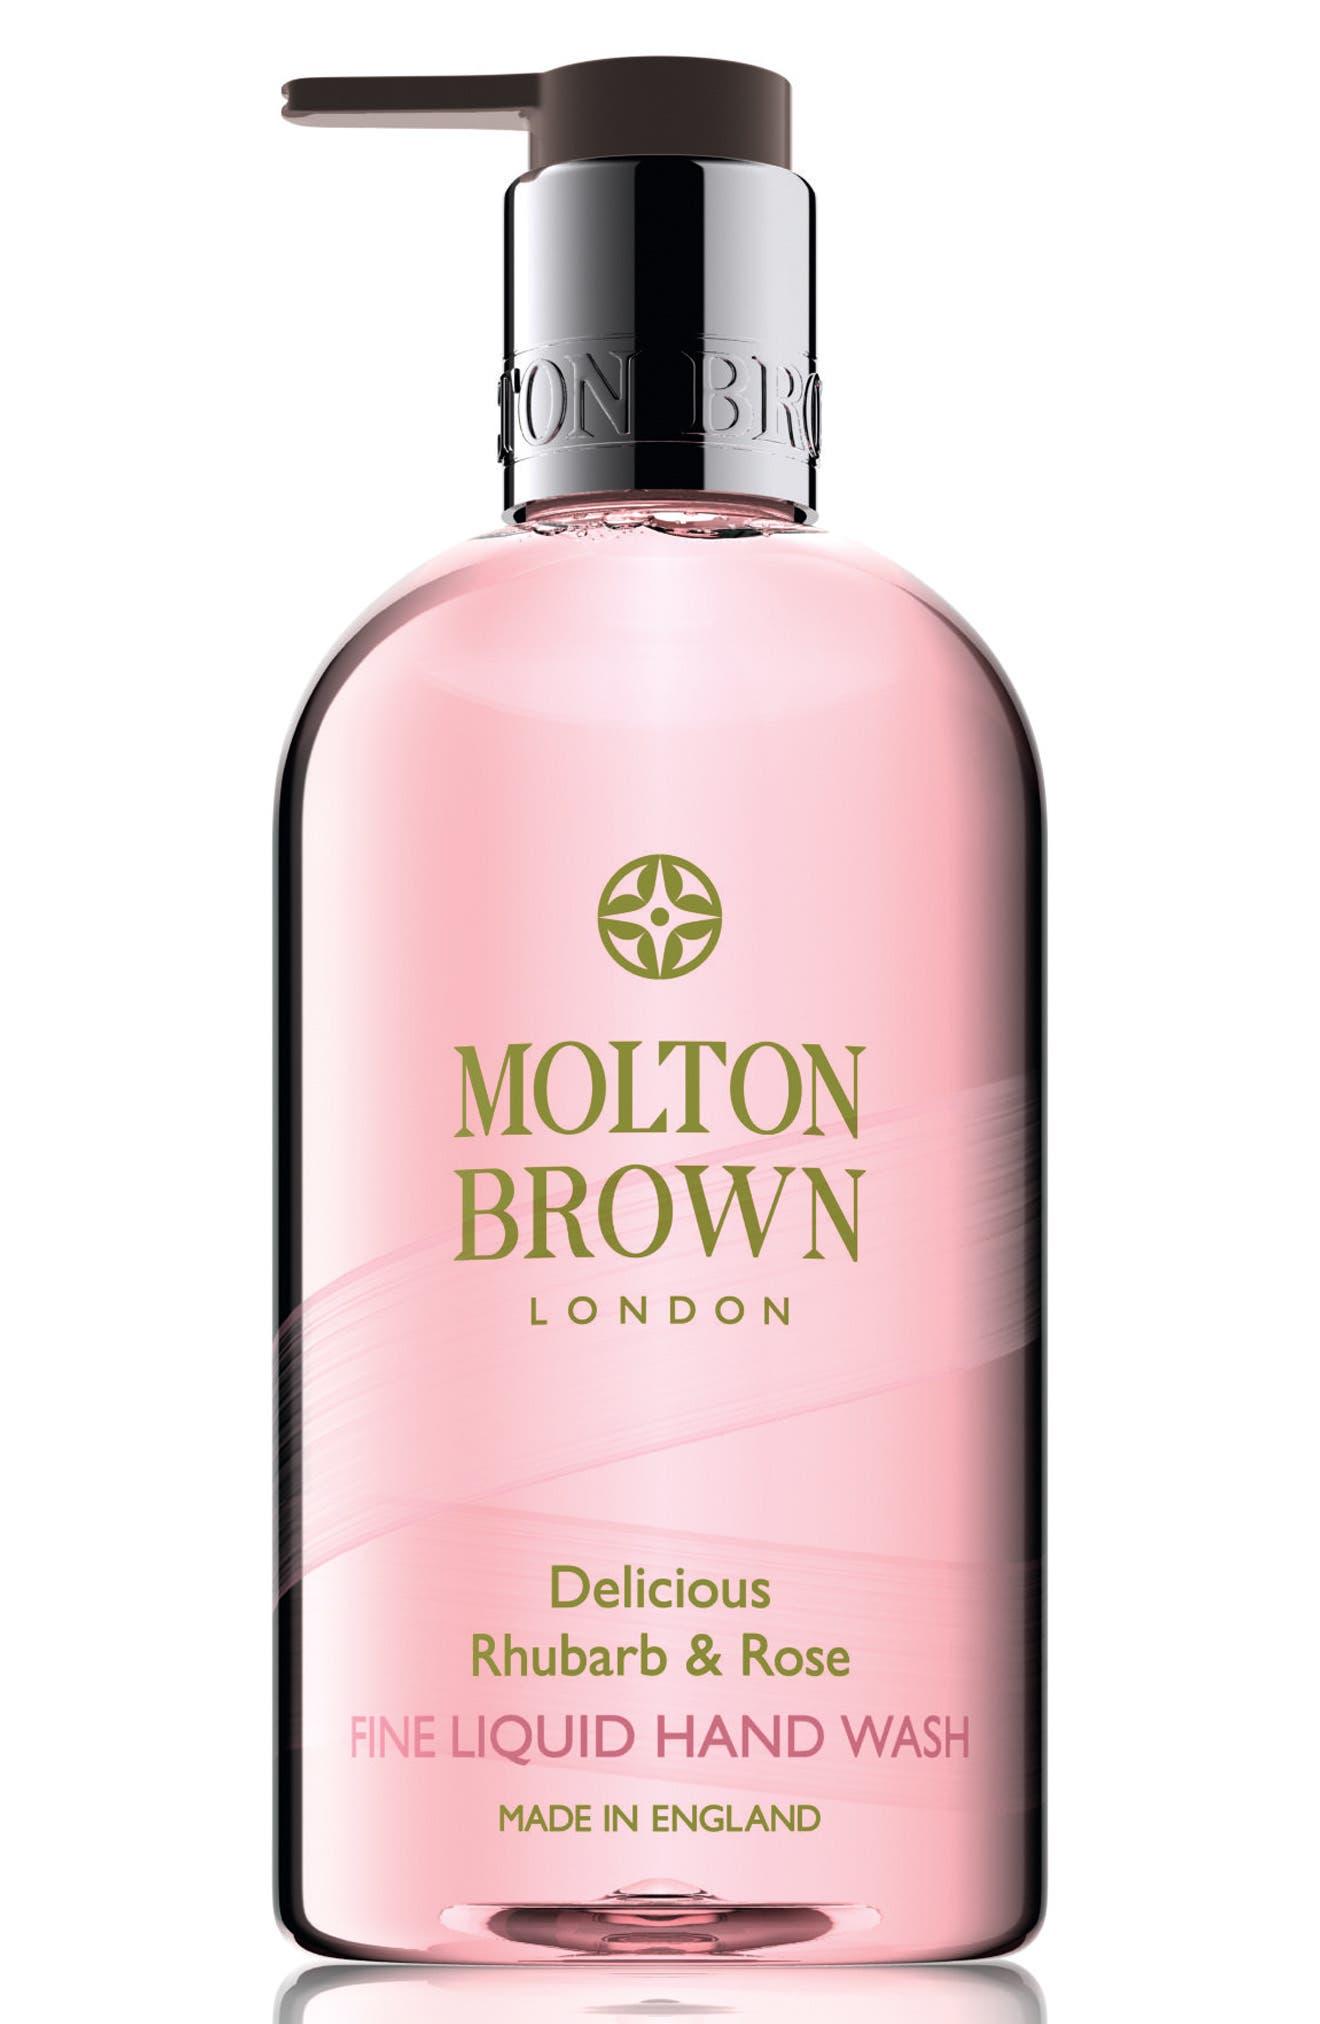 MOLTON BROWN London Delicious Rhubarb & Rose Hand Wash